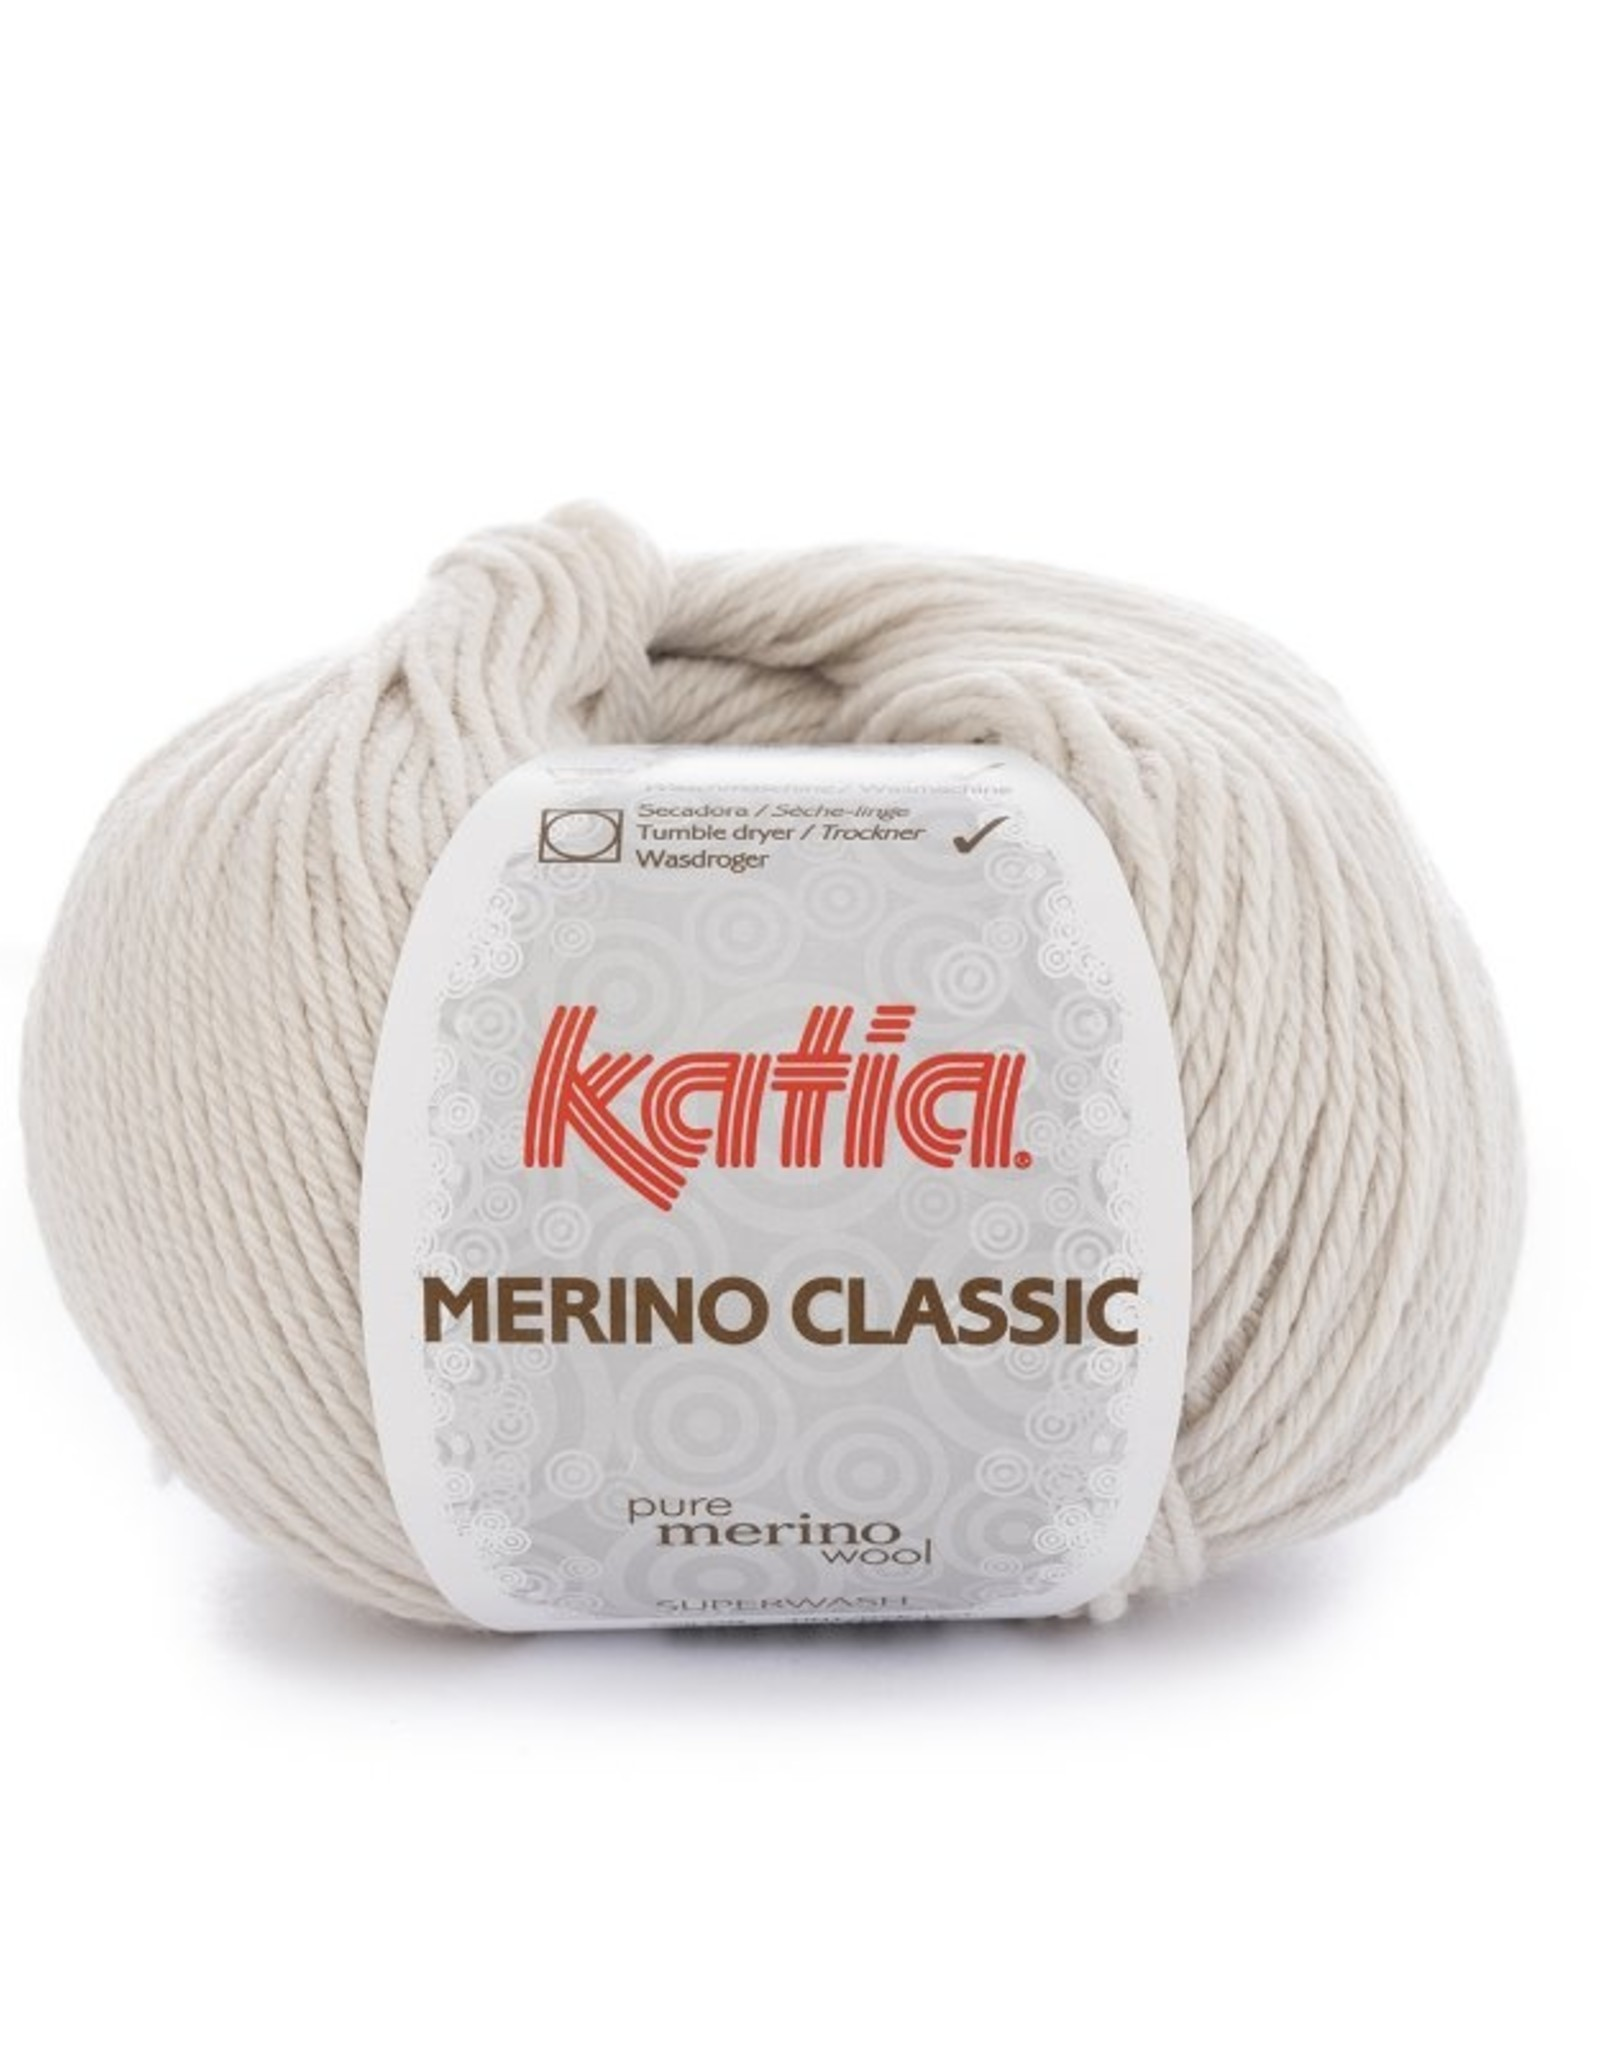 Katia Merino Classic